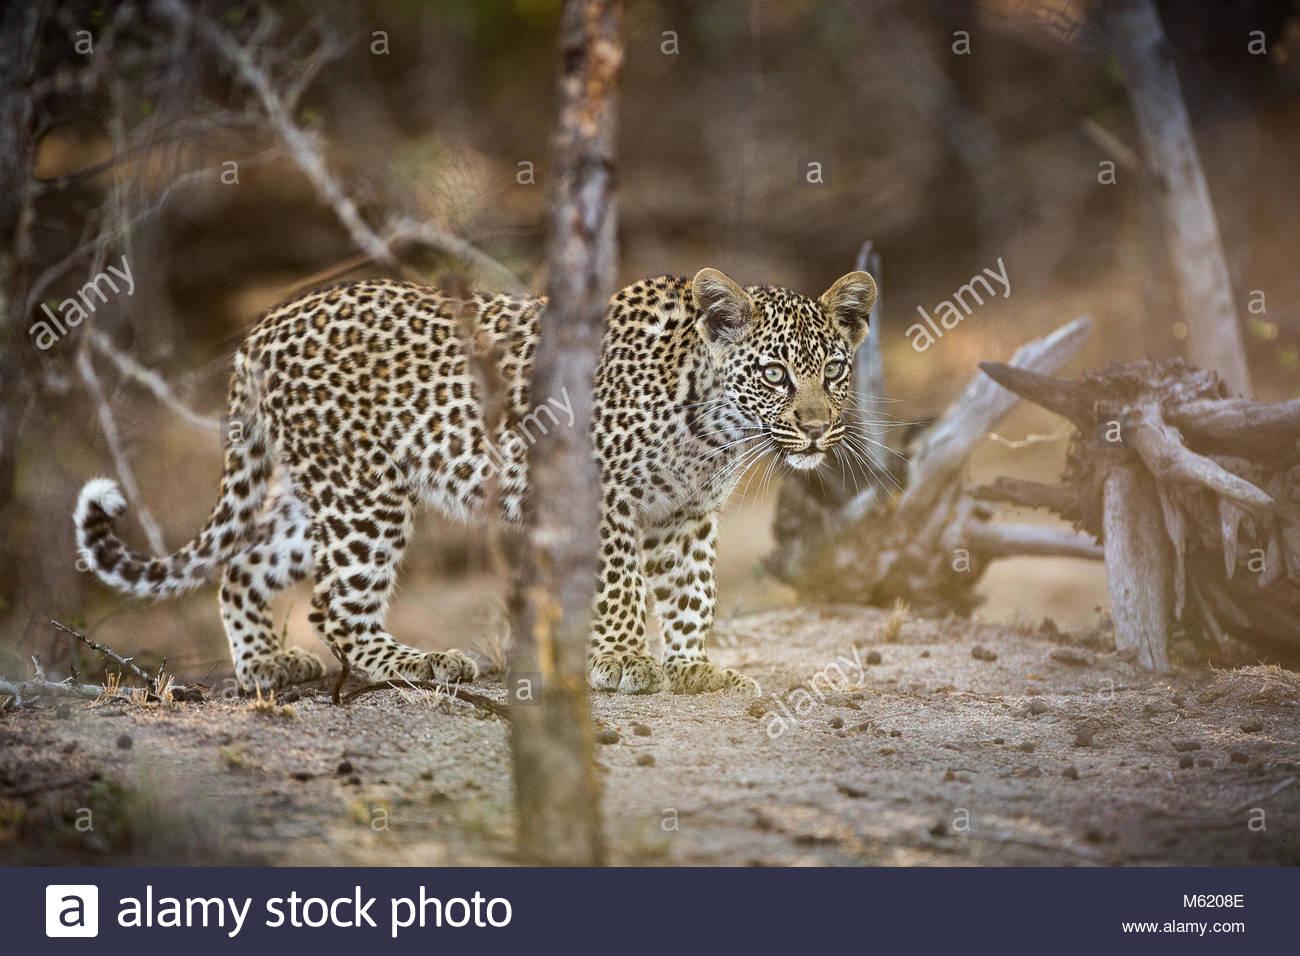 A Leopard, Panthera pardus, cub walking through the bush. - Stock Image